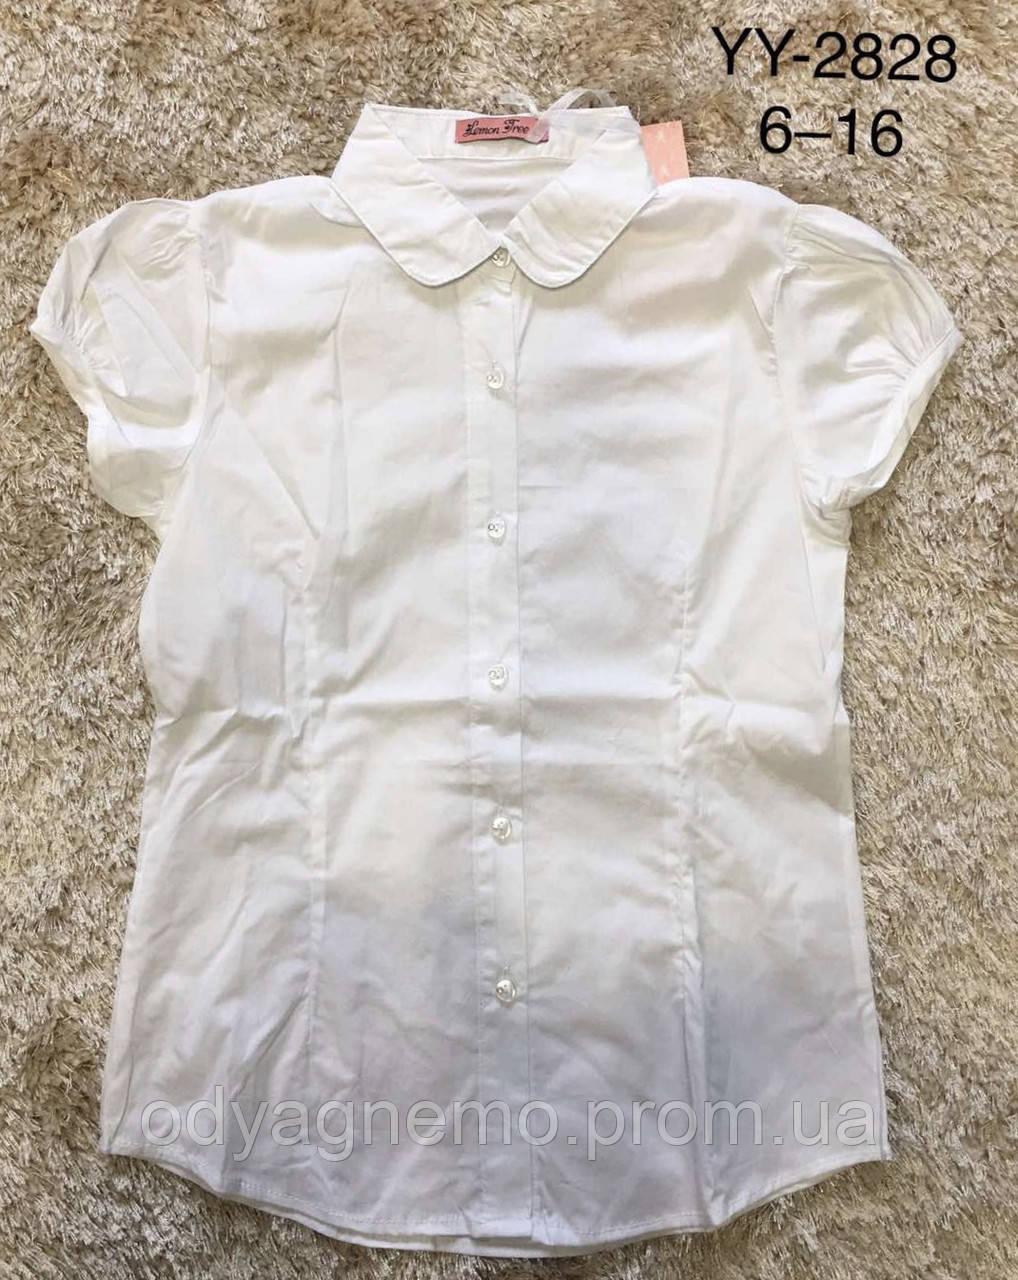 Блуза для девочек Lemon Tree,  6-16 лет. Артикул: YY2828